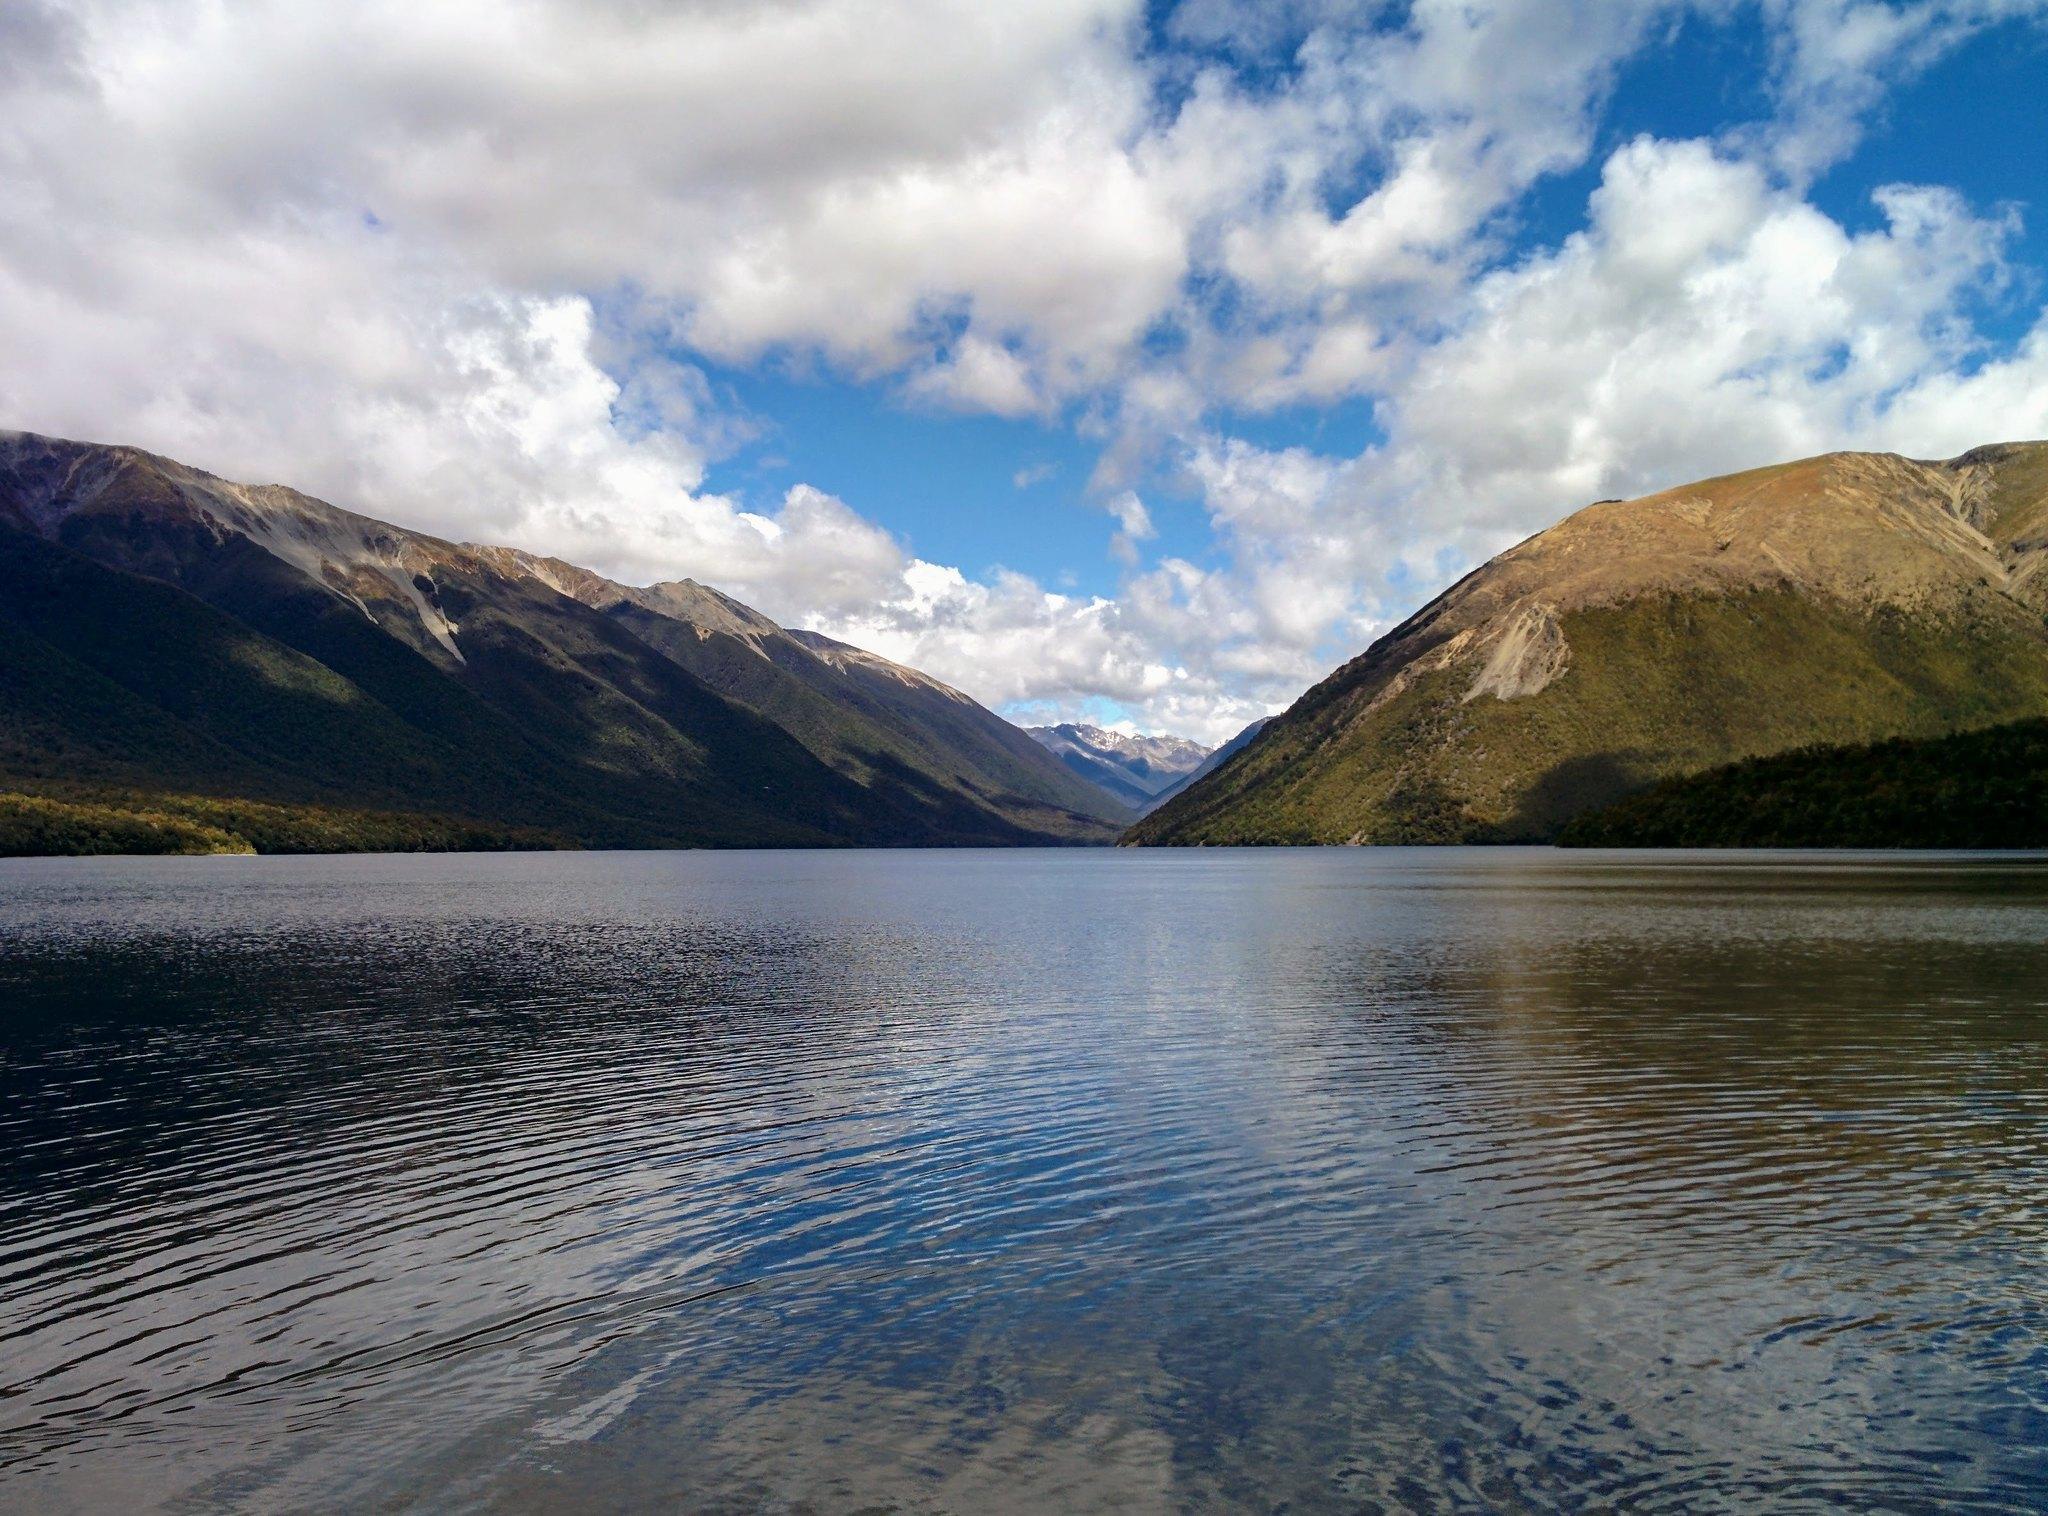 Lake Rotoiti and the surrounding mountains